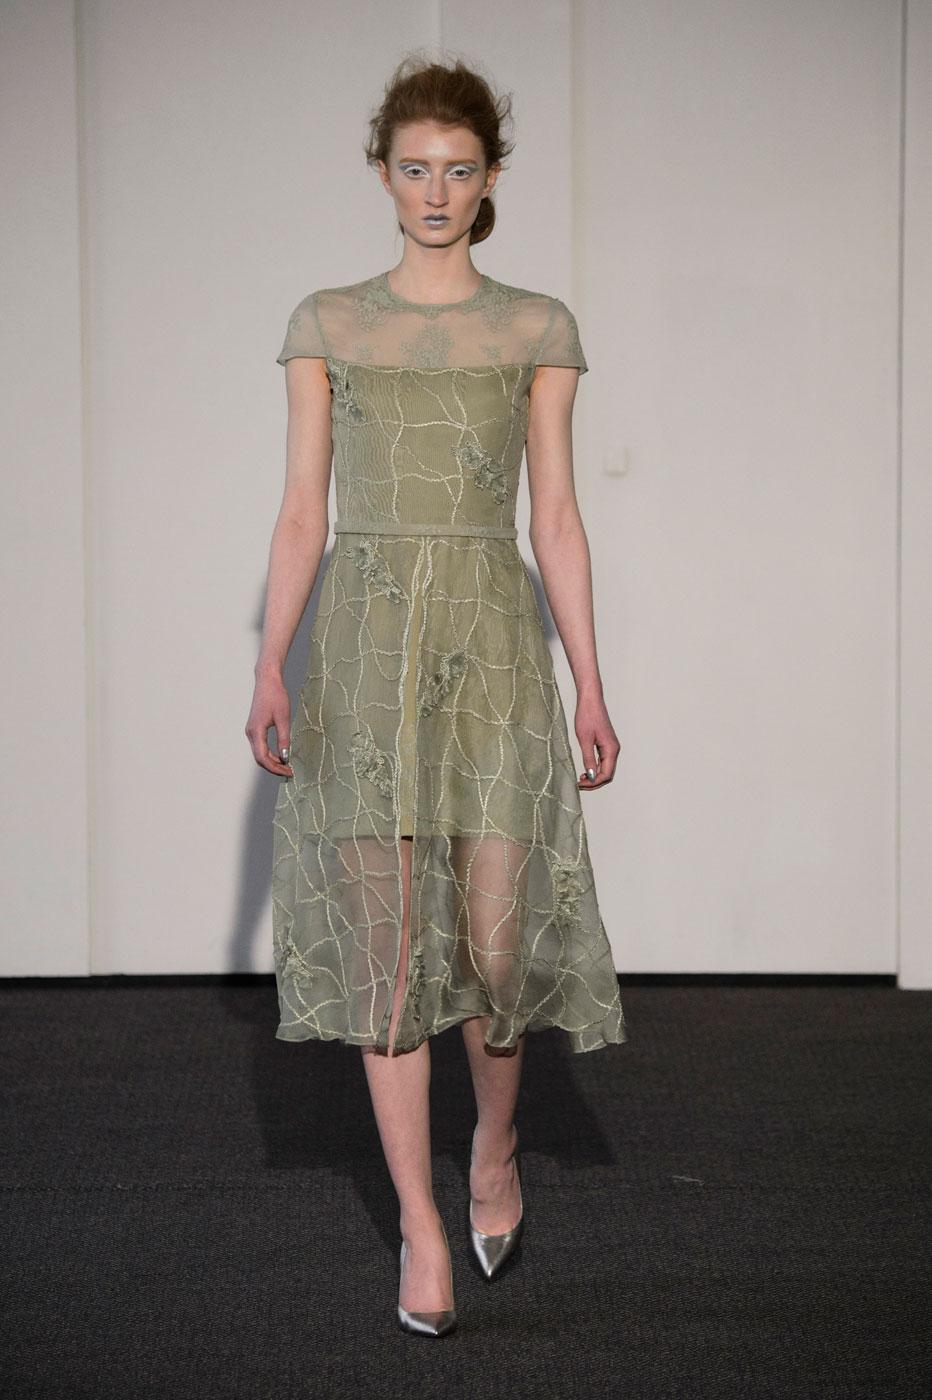 Busardi-fashion-runway-show-haute-couture-paris-spring-2015-the-impression-16